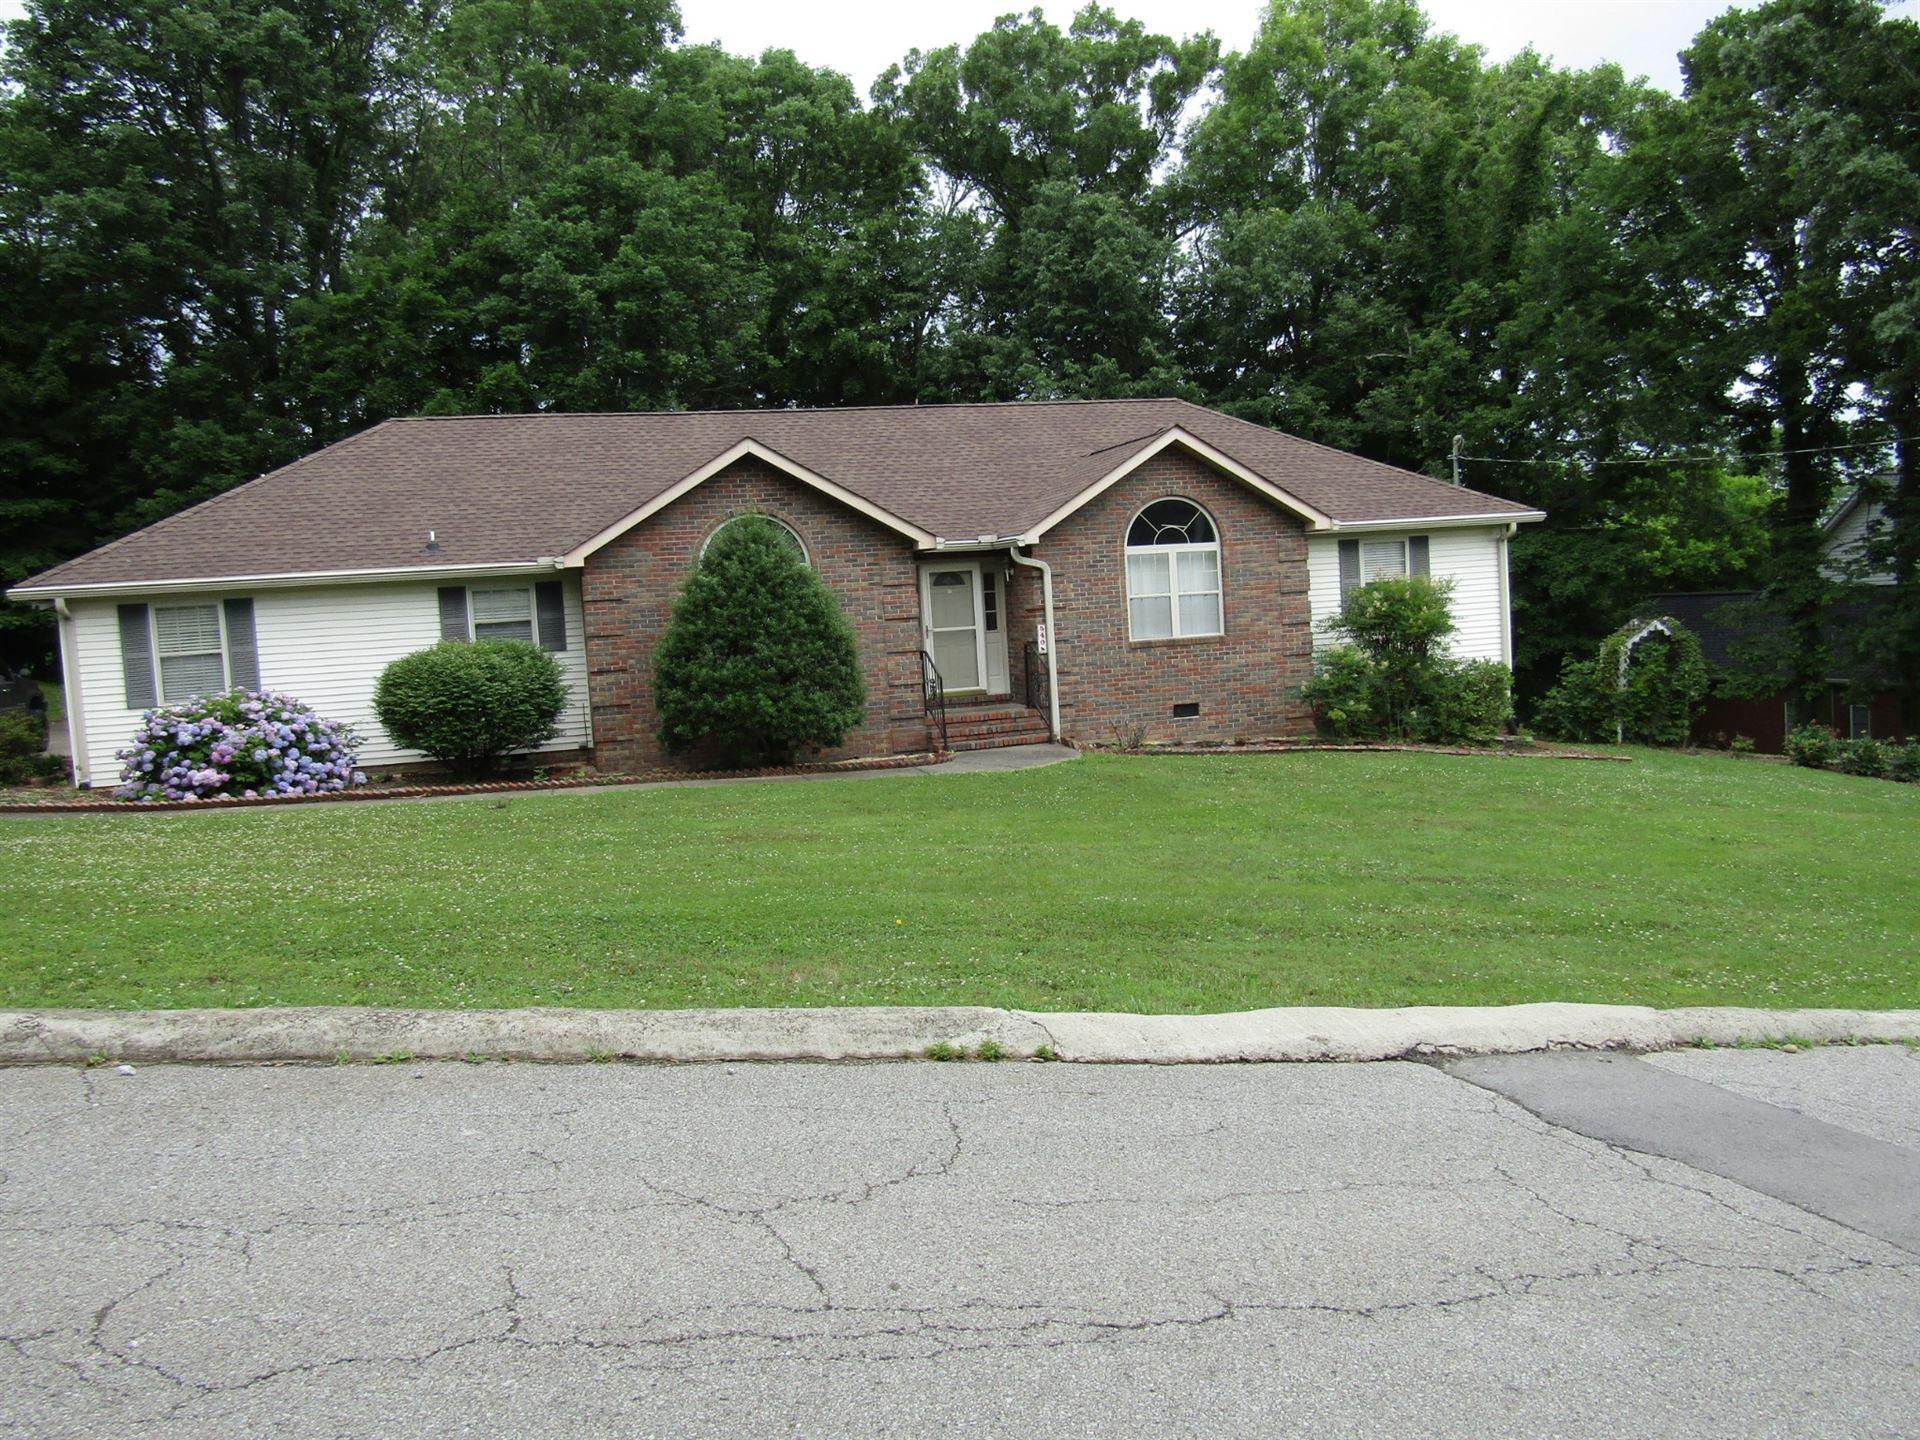 540 Skyline Dr S, Lewisburg, TN 37091 - MLS#: 2260489